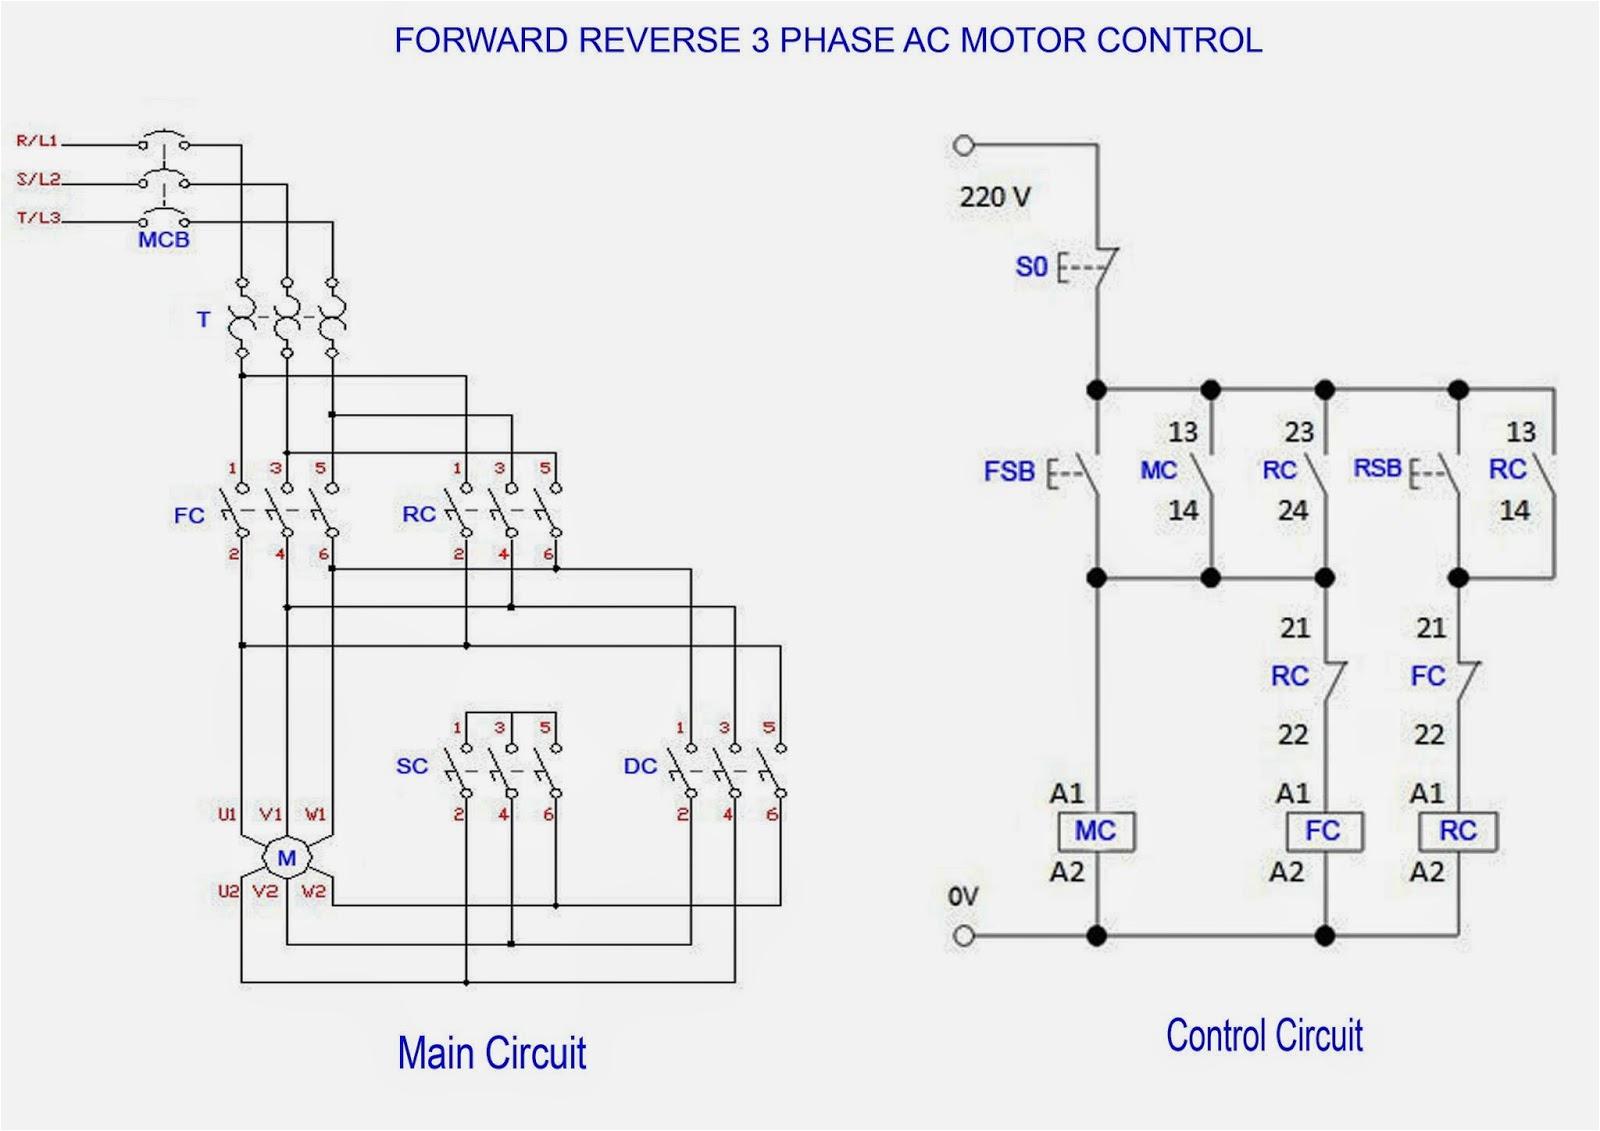 3 Phase Electric Motor Wiring Diagram 3 Phase Motor Starter Wiring Wiring Diagram Database